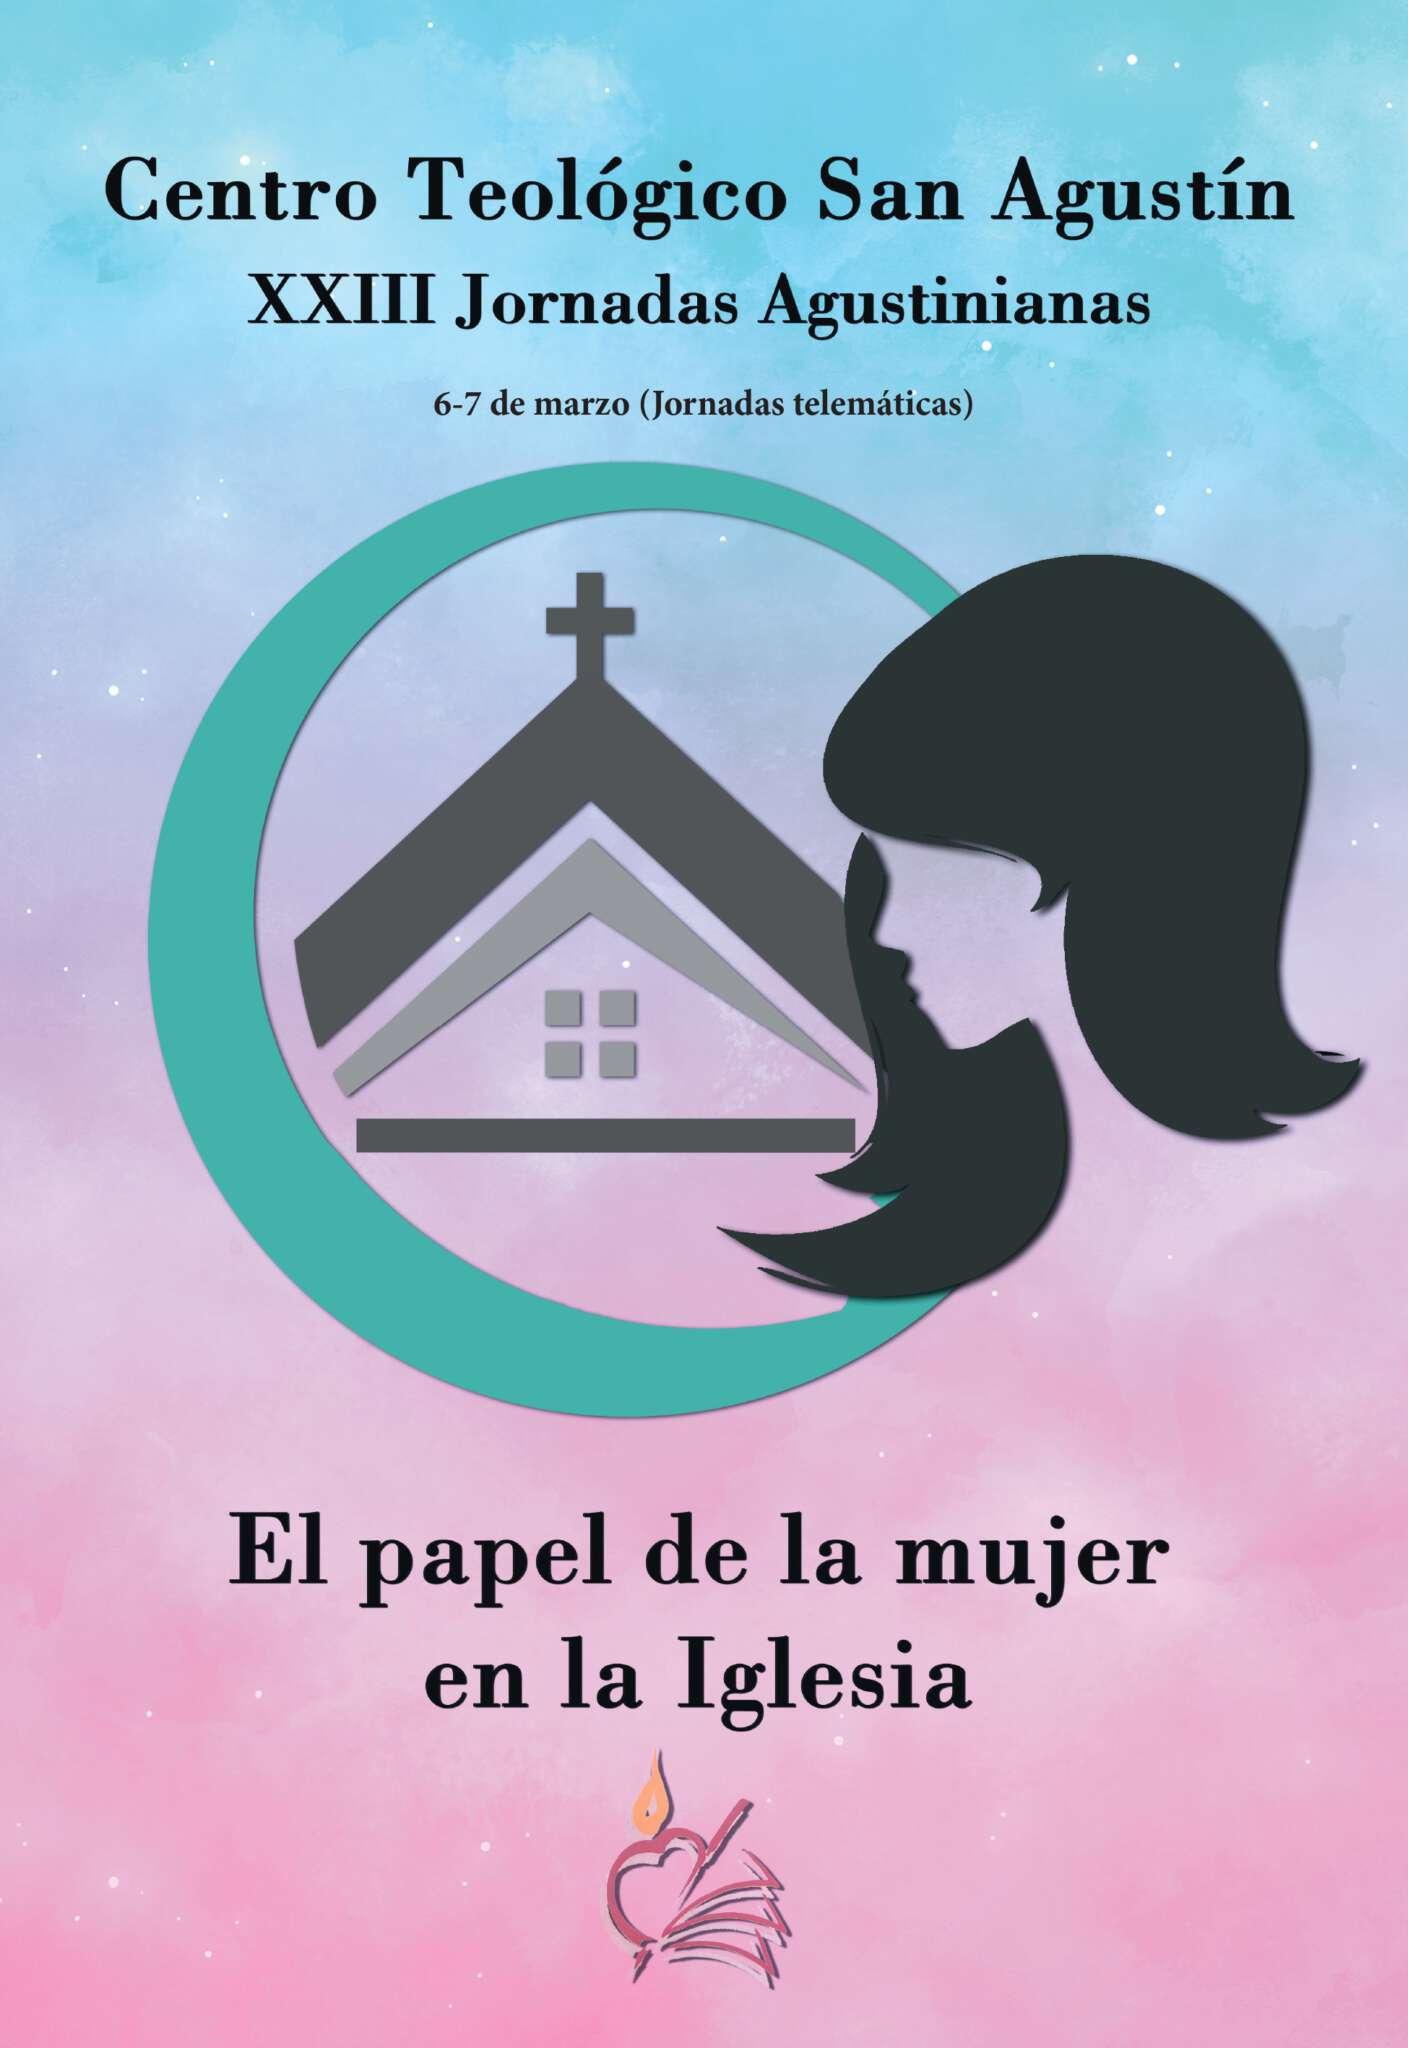 El Centro Teológico San Agustín, perteneciente a la Provincia de San Juan de Sahagún de España, de la Orden de San Agustín ha organizado estas jornadas.